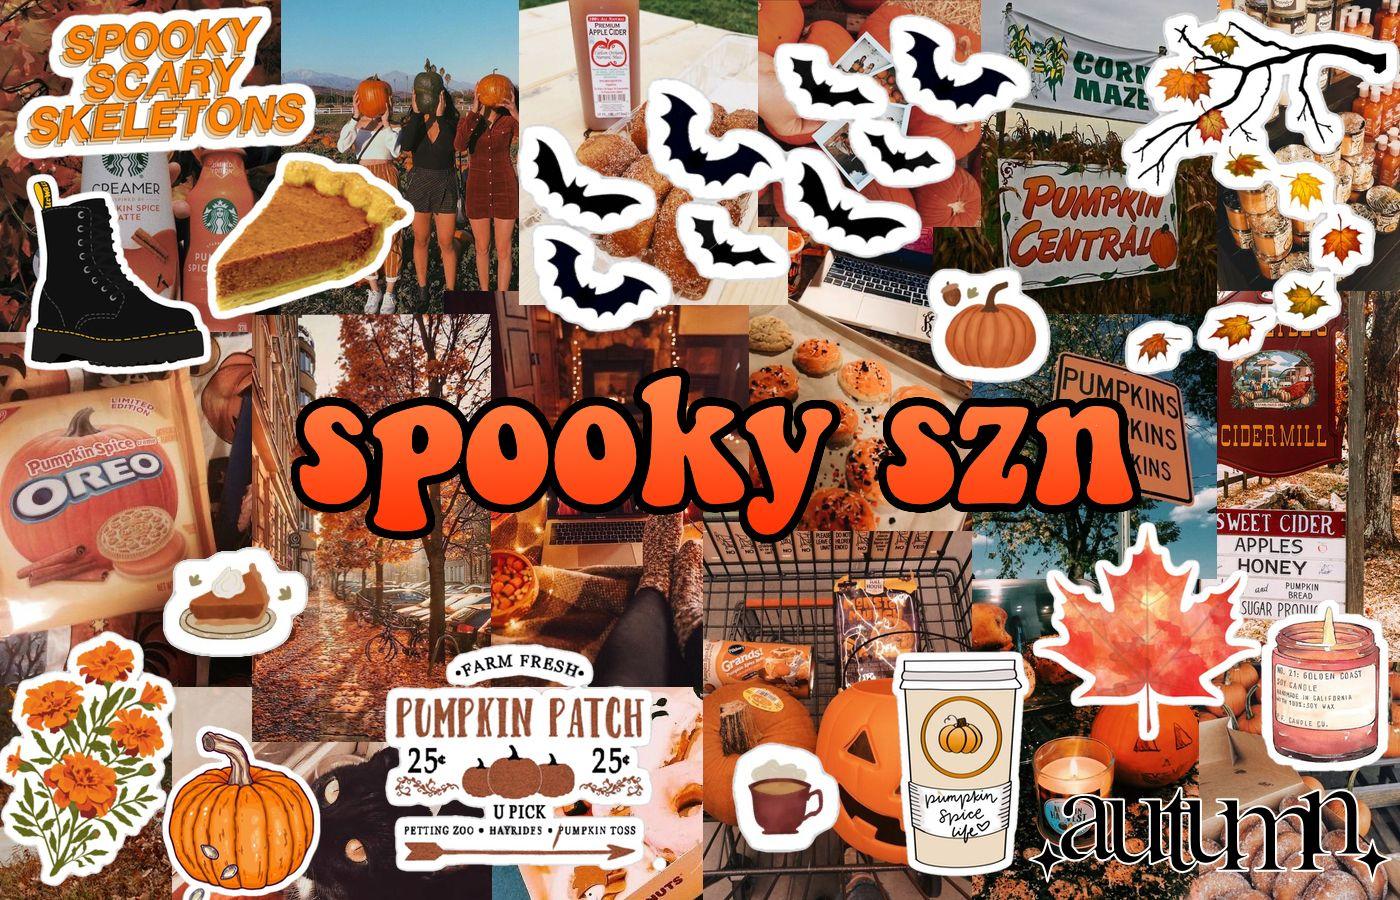 Aesthetic Vsco Y2k Fall Autumn Halloween Thanksgiving Macbook Wallpaper Orange Pumpkin Leav Halloween Desktop Wallpaper Macbook Wallpaper Macbook Air Wallpaper